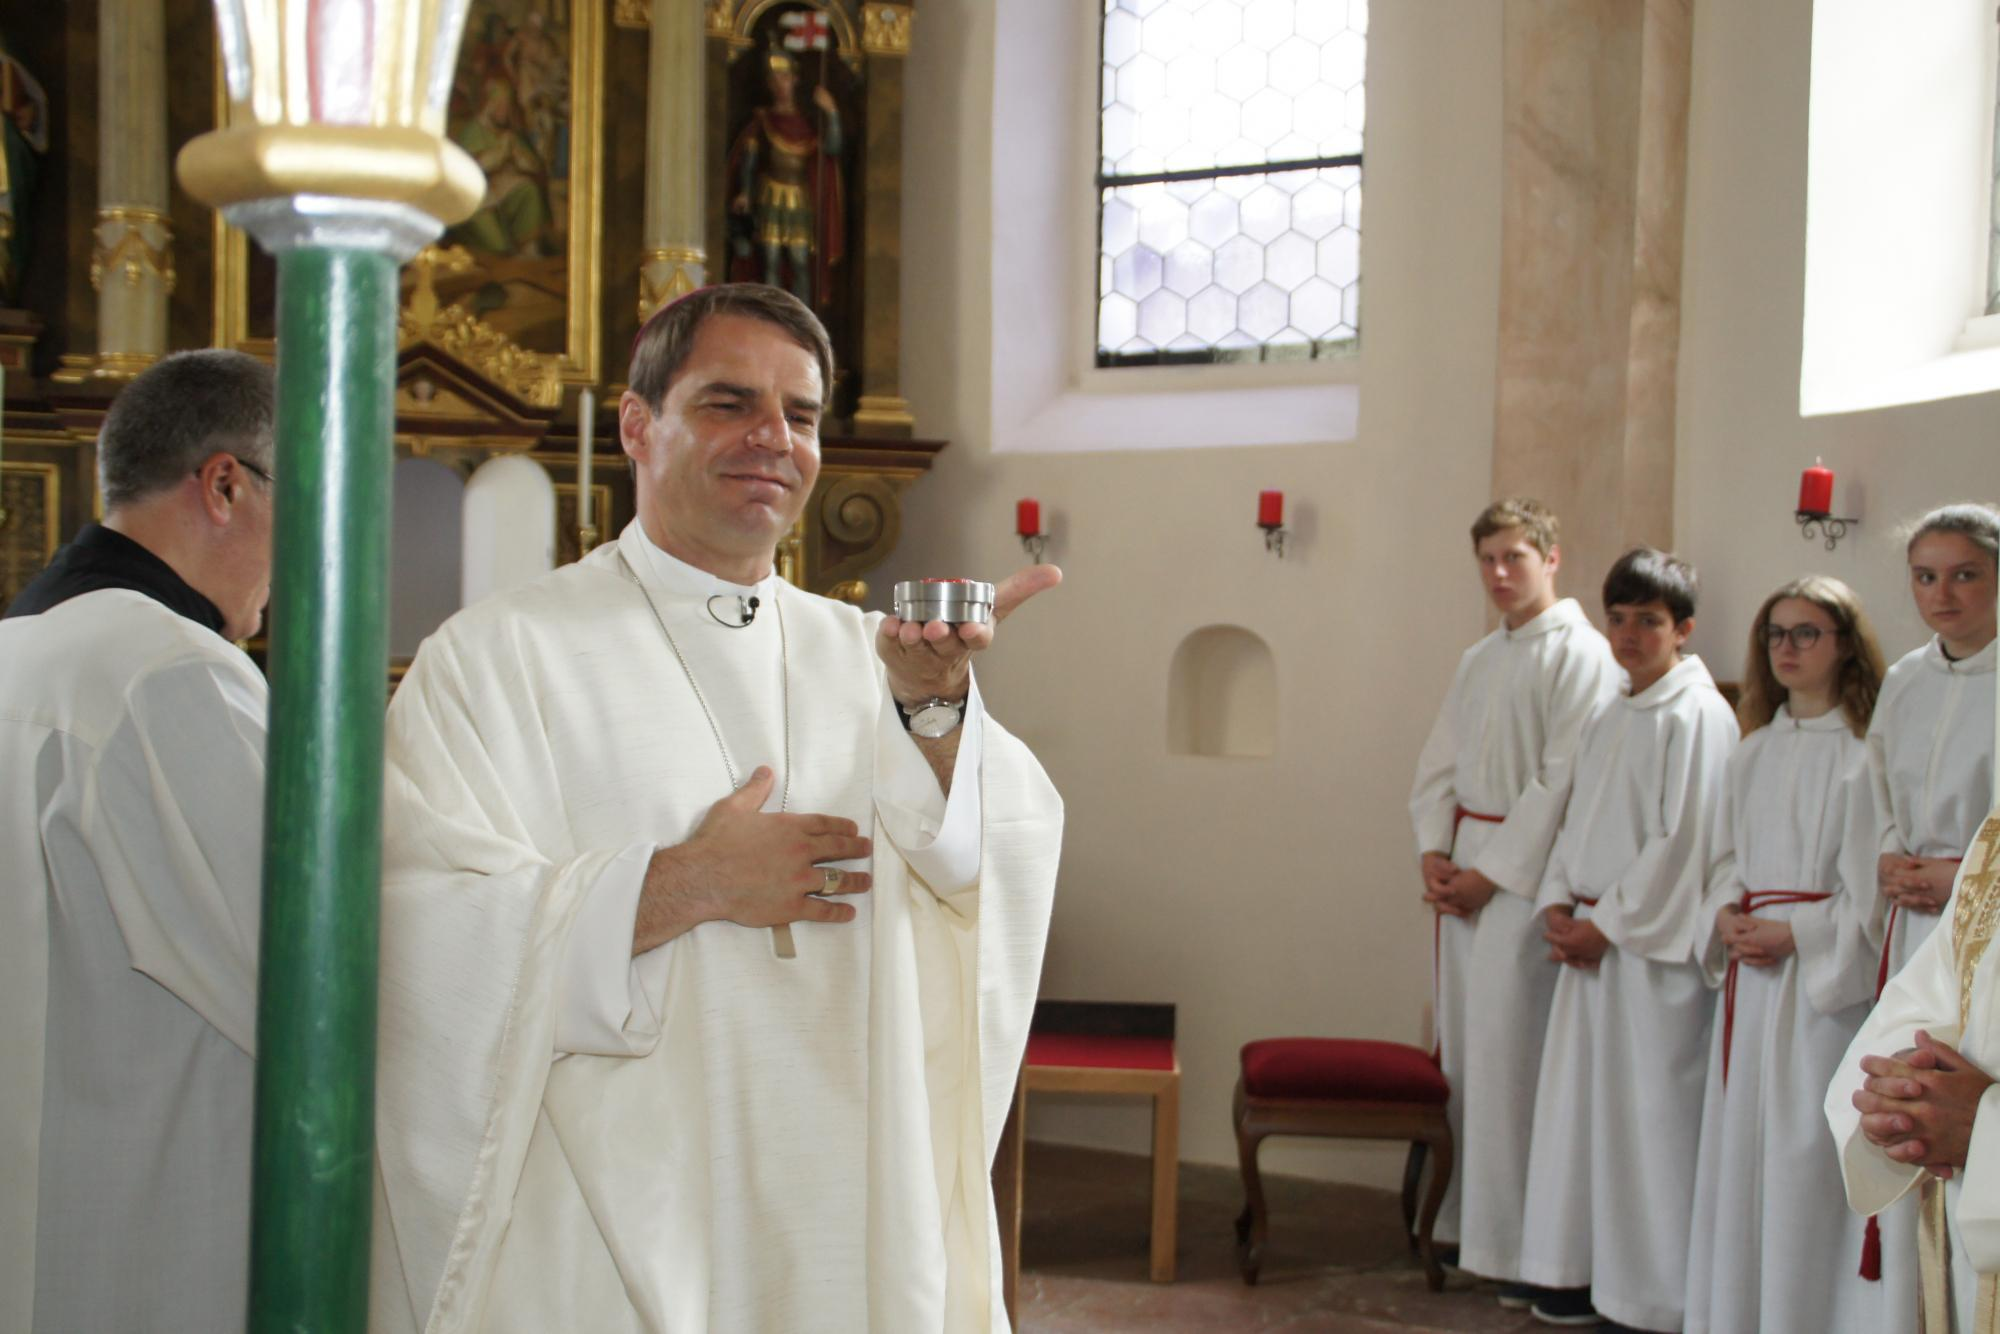 Altarweihe-Lengsham-DSC06289